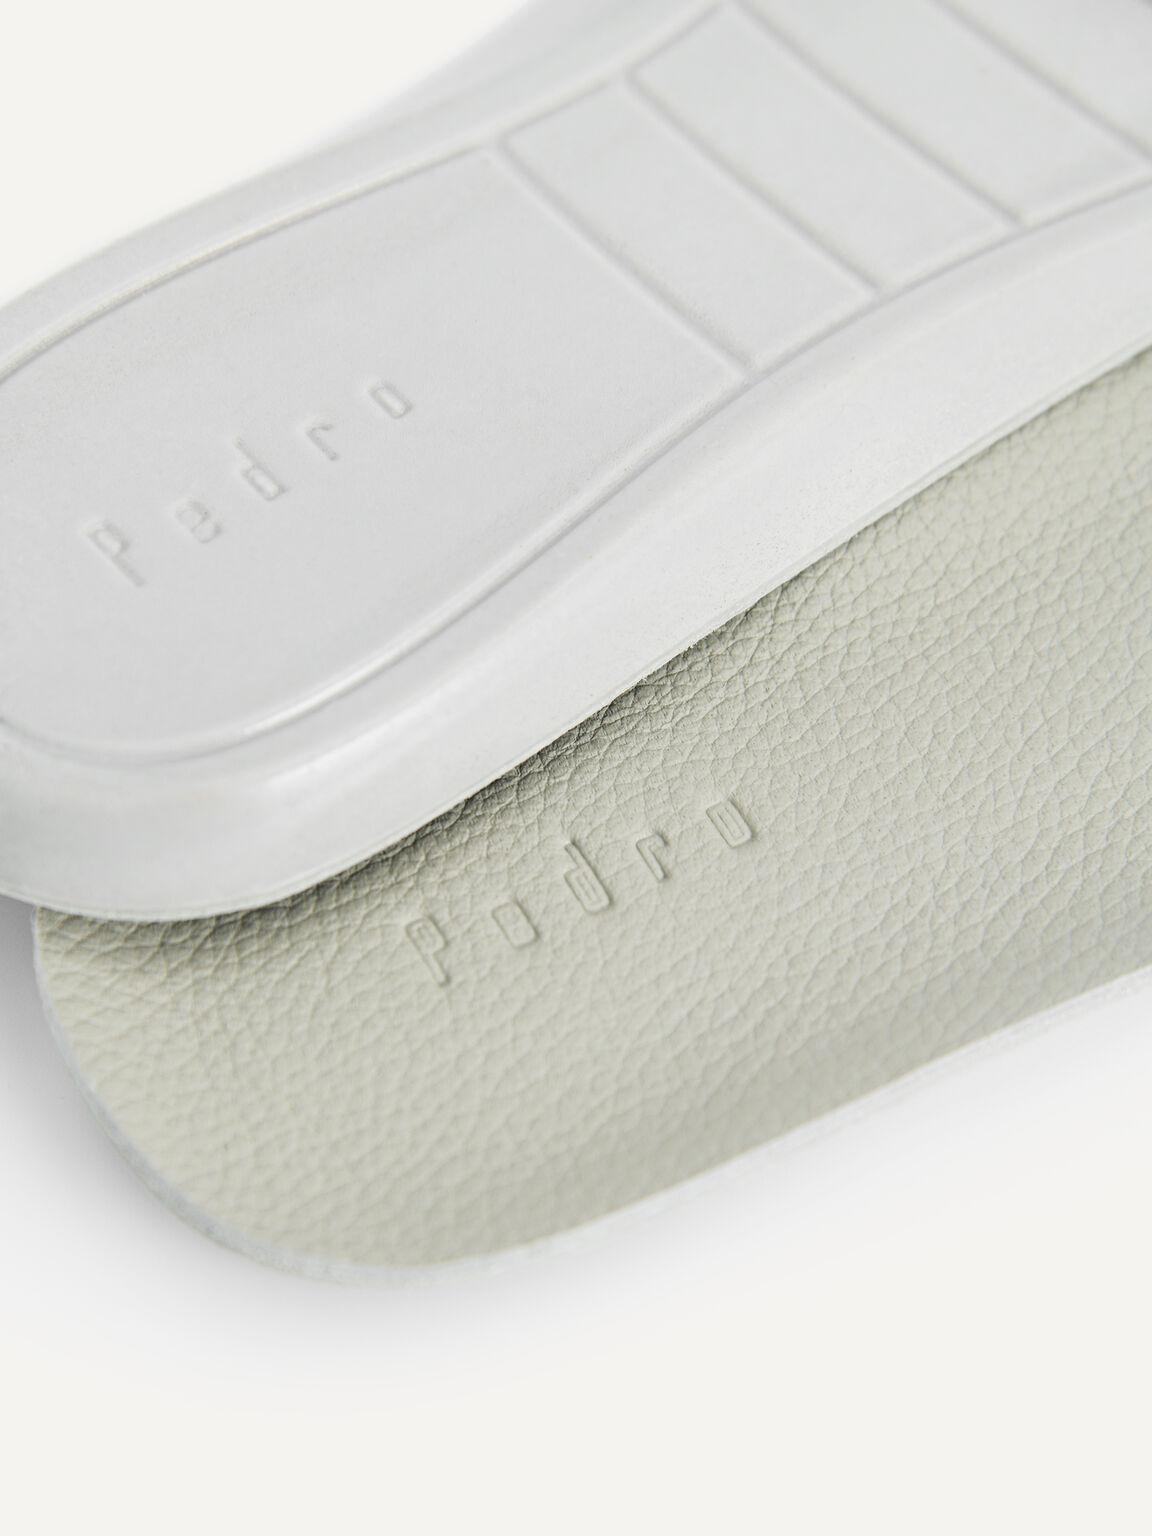 Sports Cushion Insole, Light Grey, hi-res